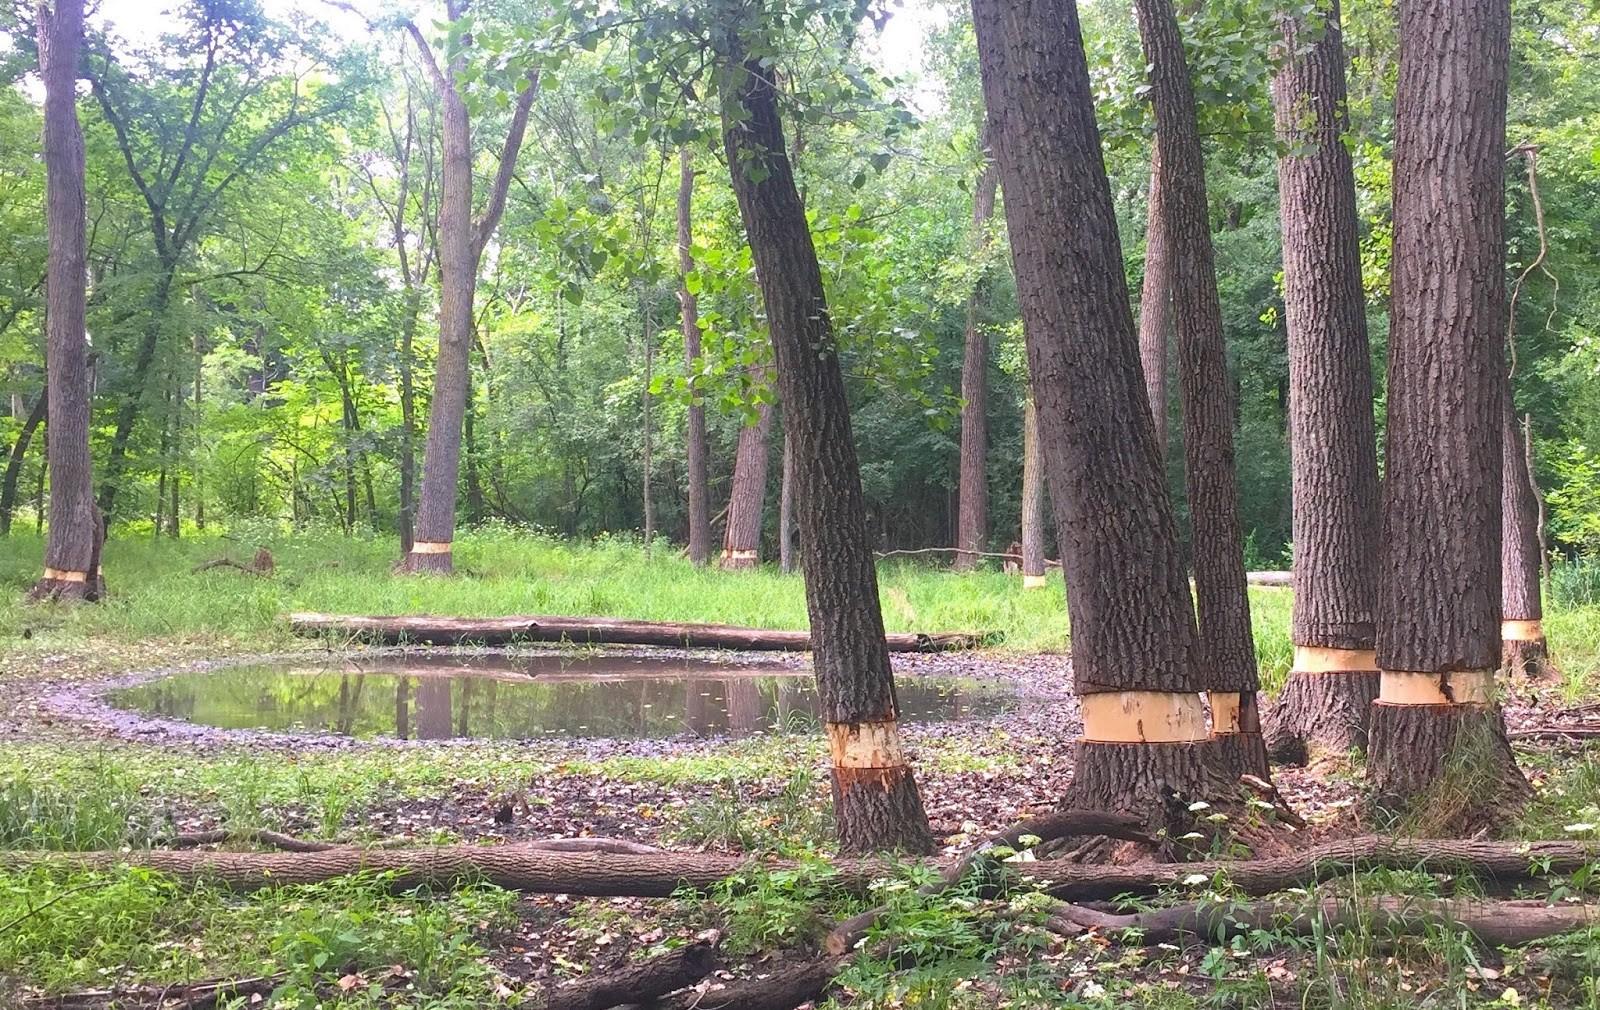 Girdling of Woody Invasive Species